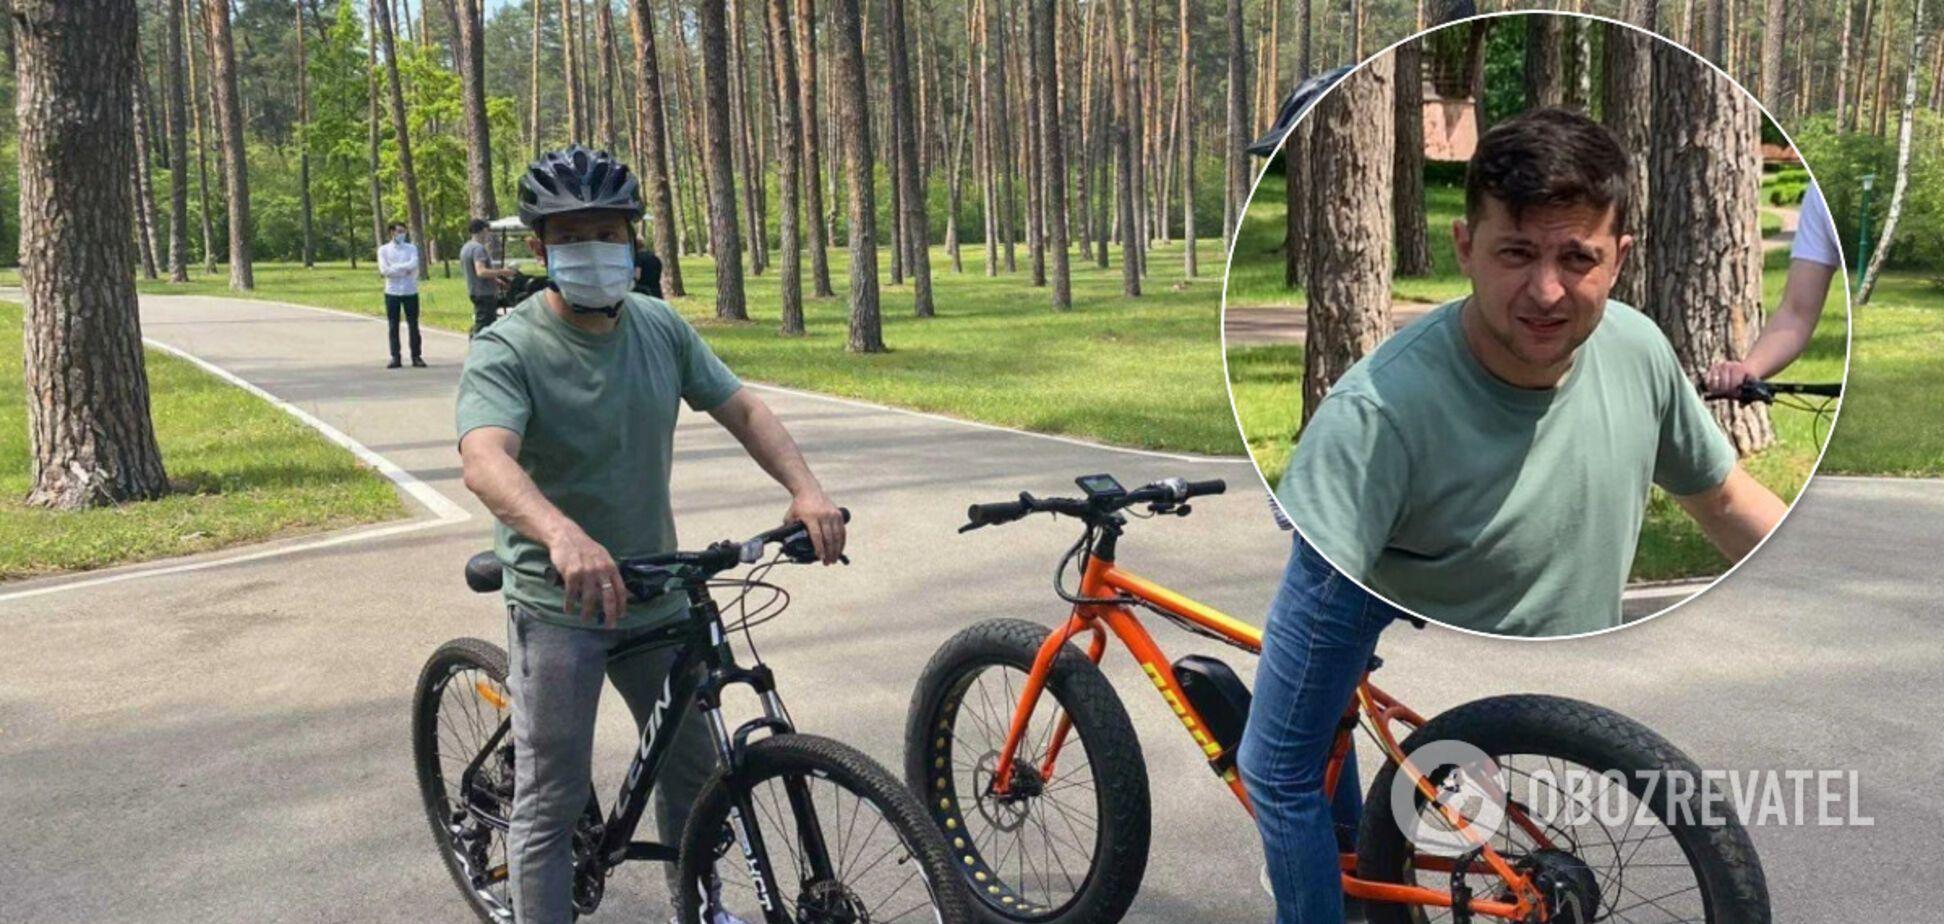 Зеленский покатался с журналистами на велосипедах. Фото